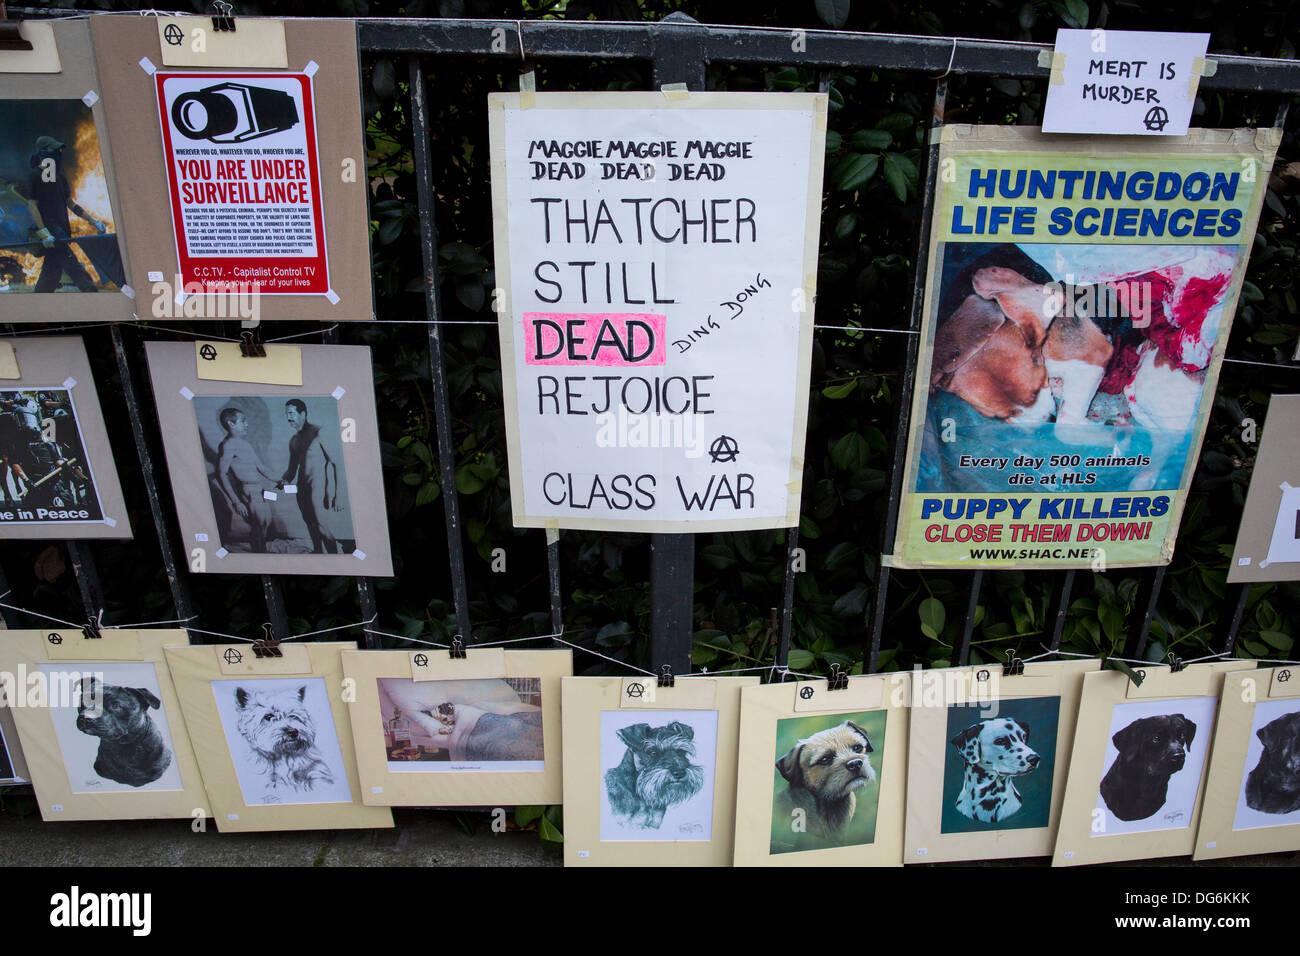 MARGARET THATCHER HANDMADE CLASS WAR PROTEST POSTER - Stock Image